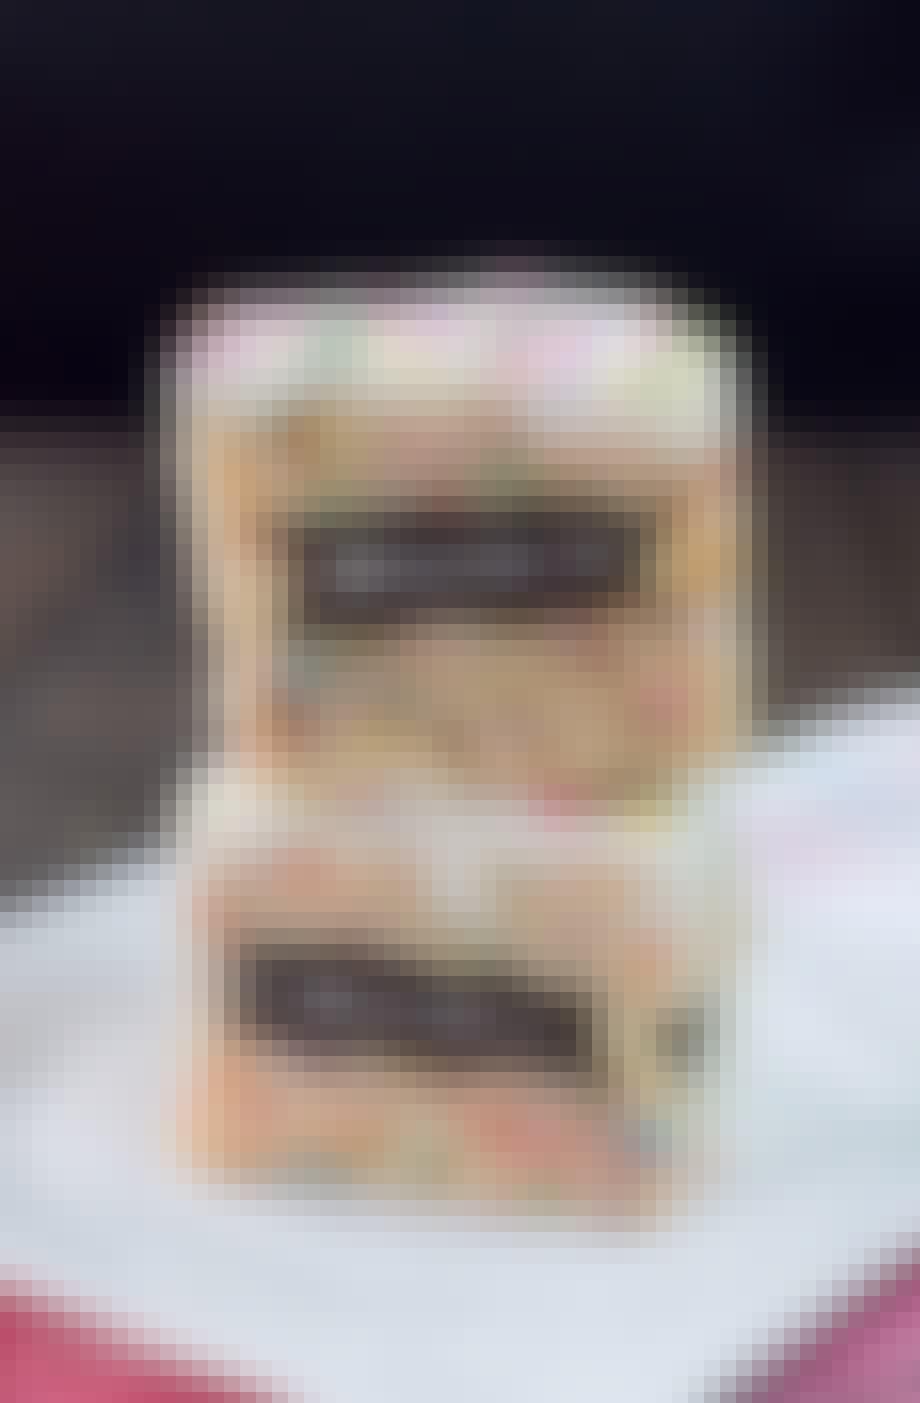 Rice Krispie-kager fyldt med Oreos